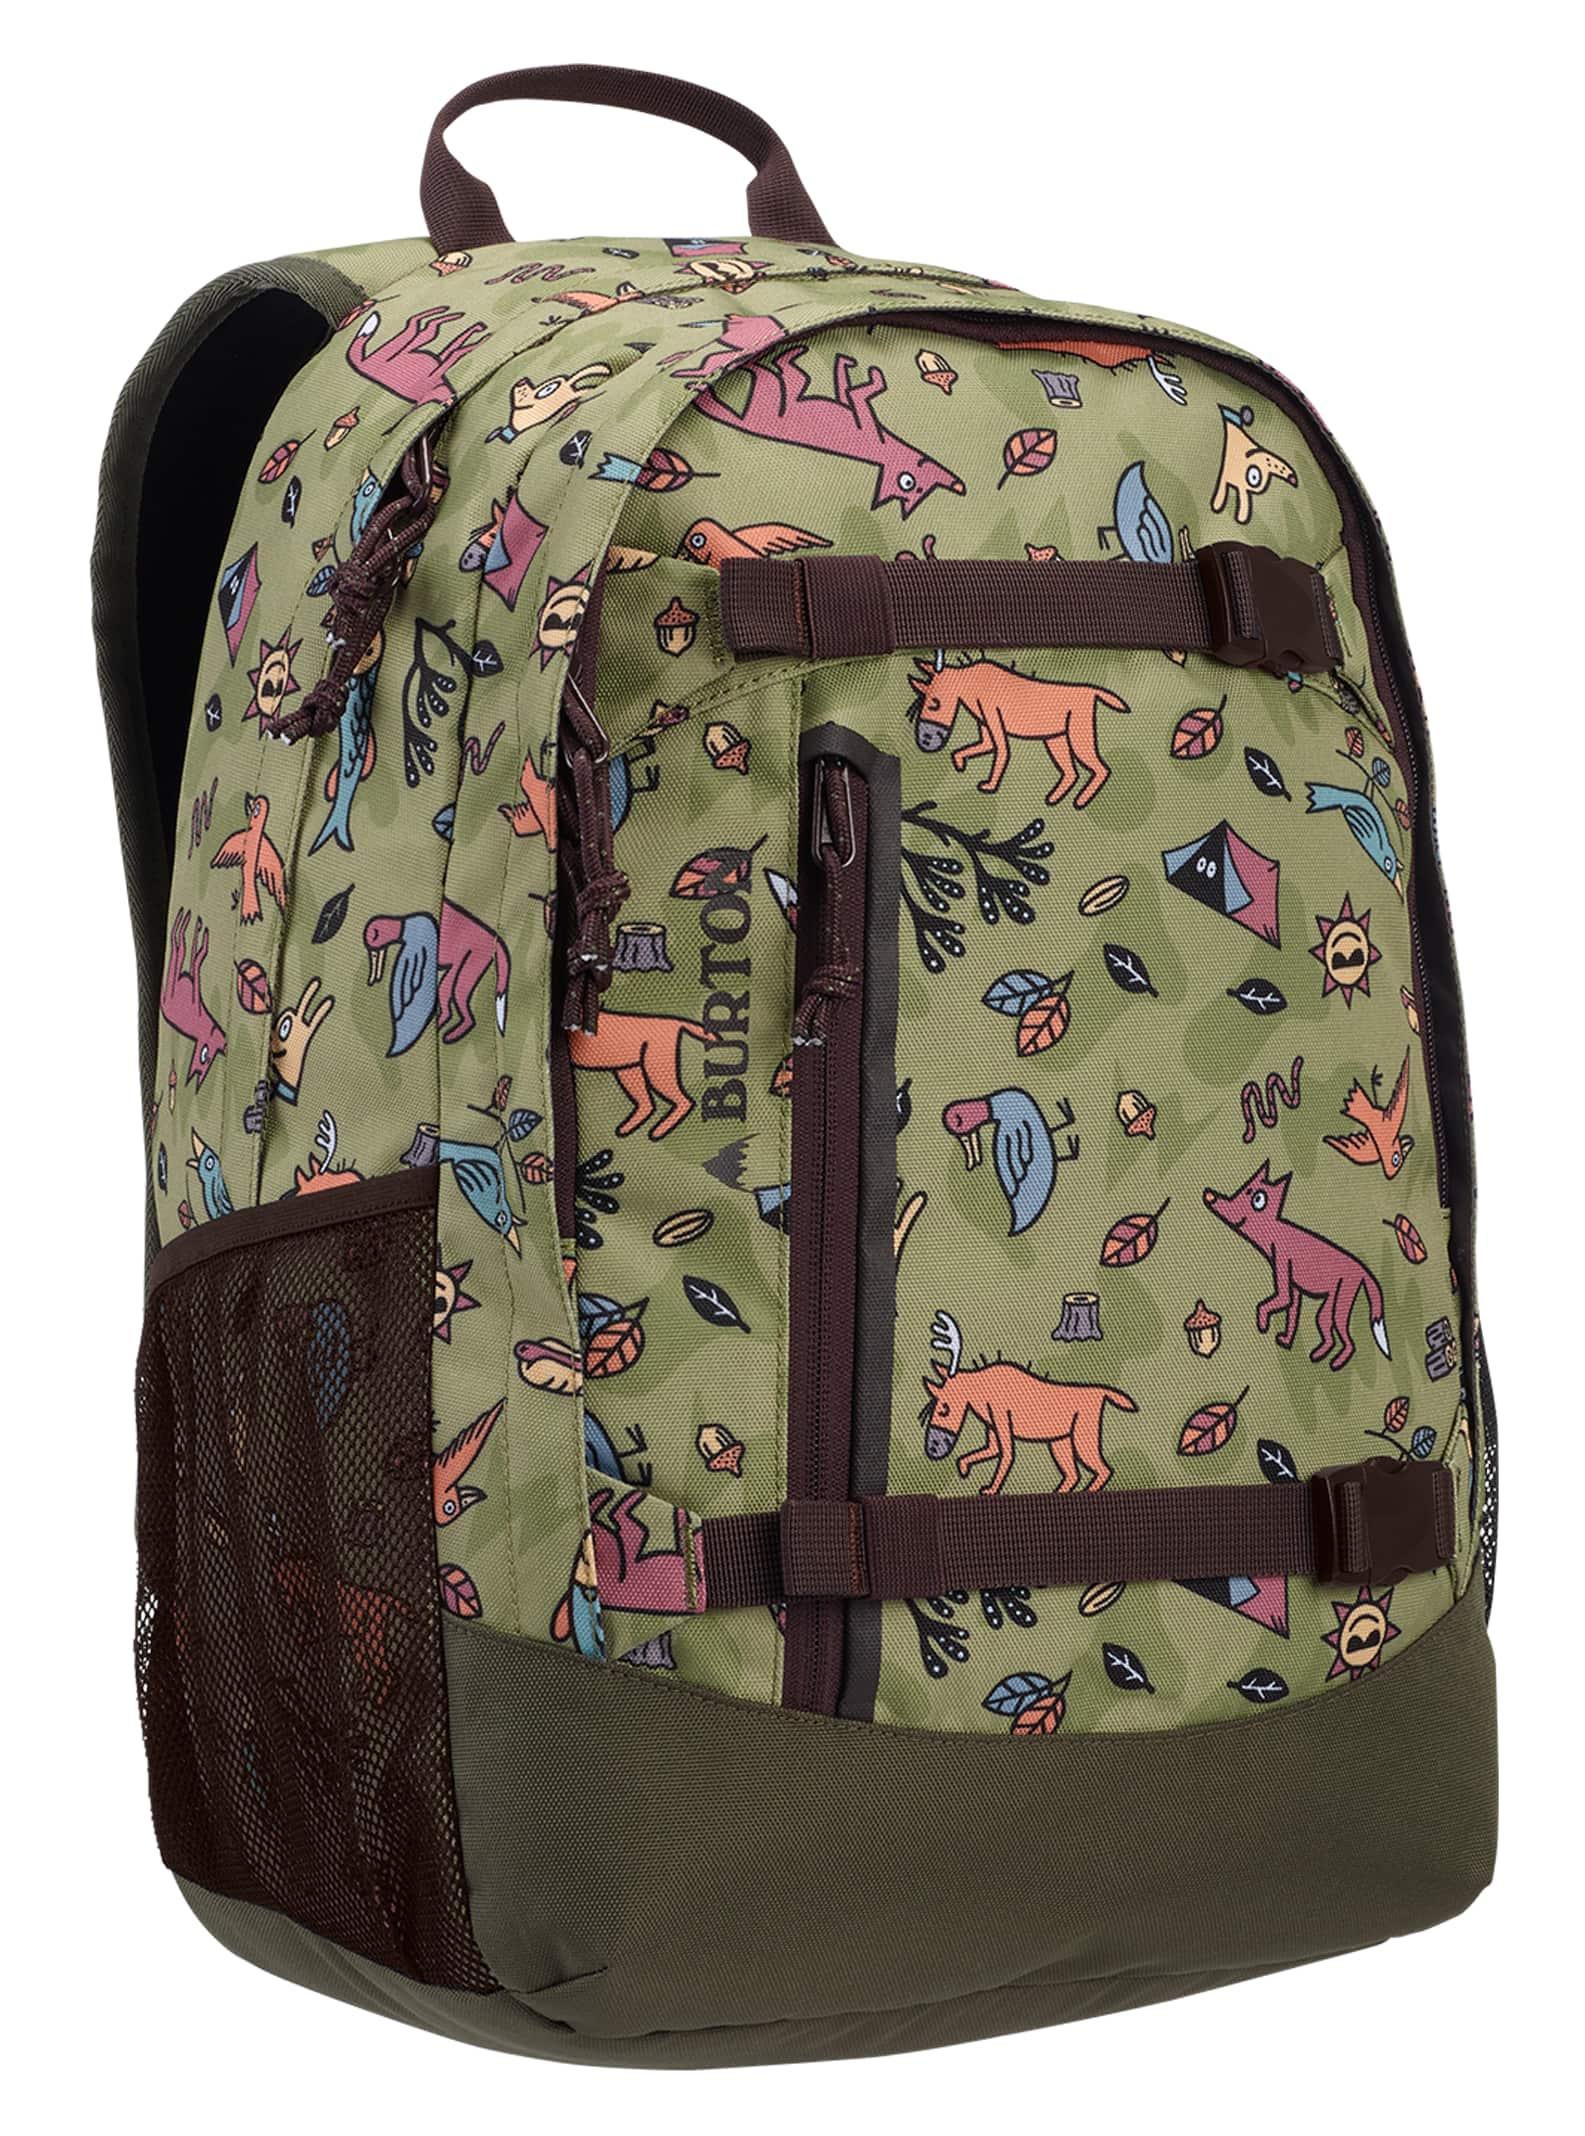 3f9054a5559 Backpacks | Burton Snowboards